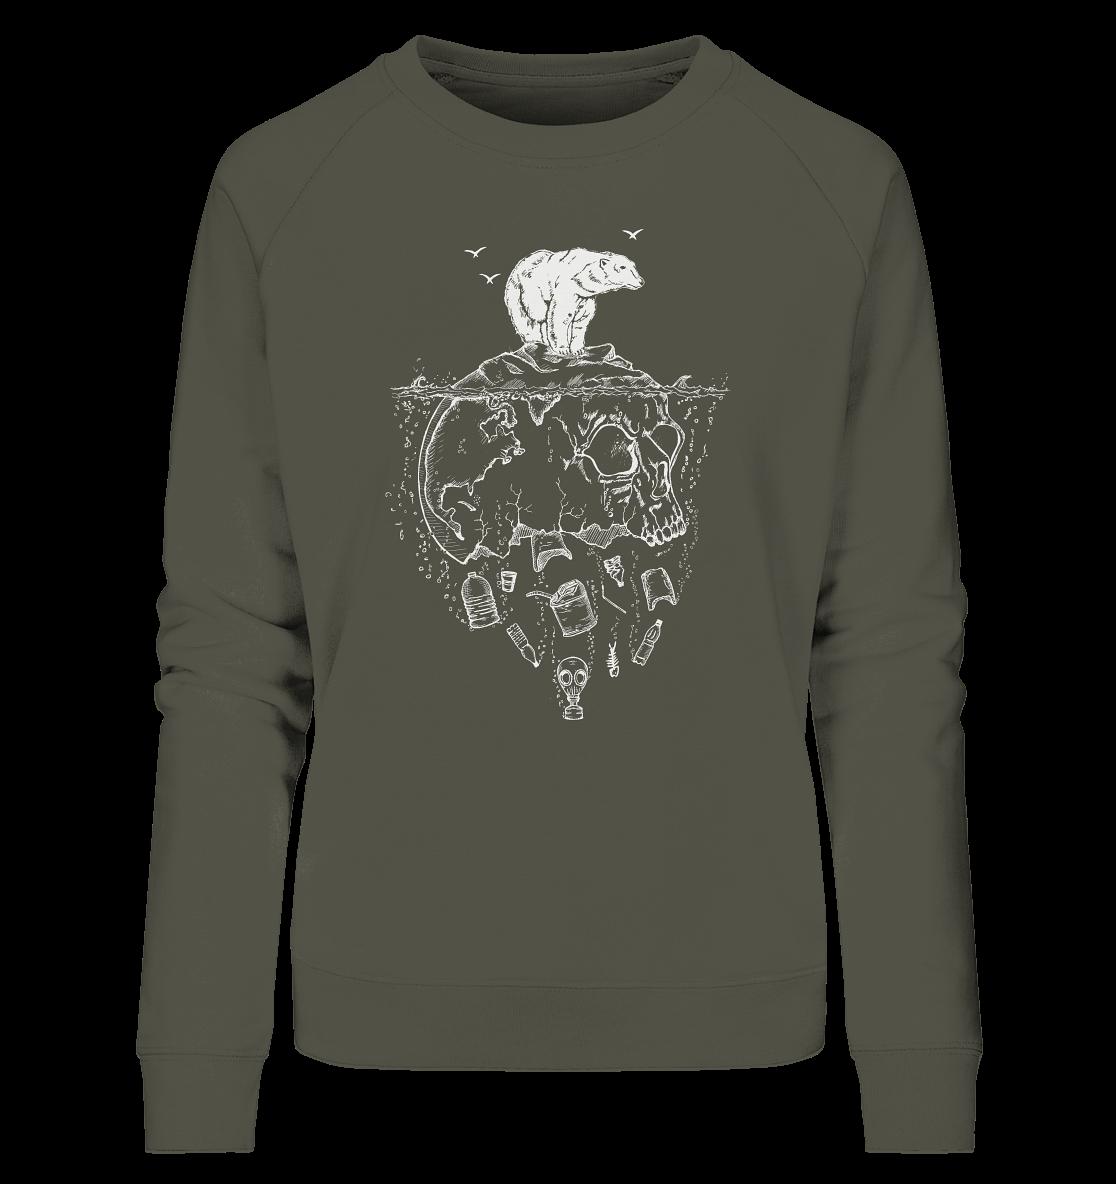 front-ladies-organic-sweatshirt-545348-1116x-5.png